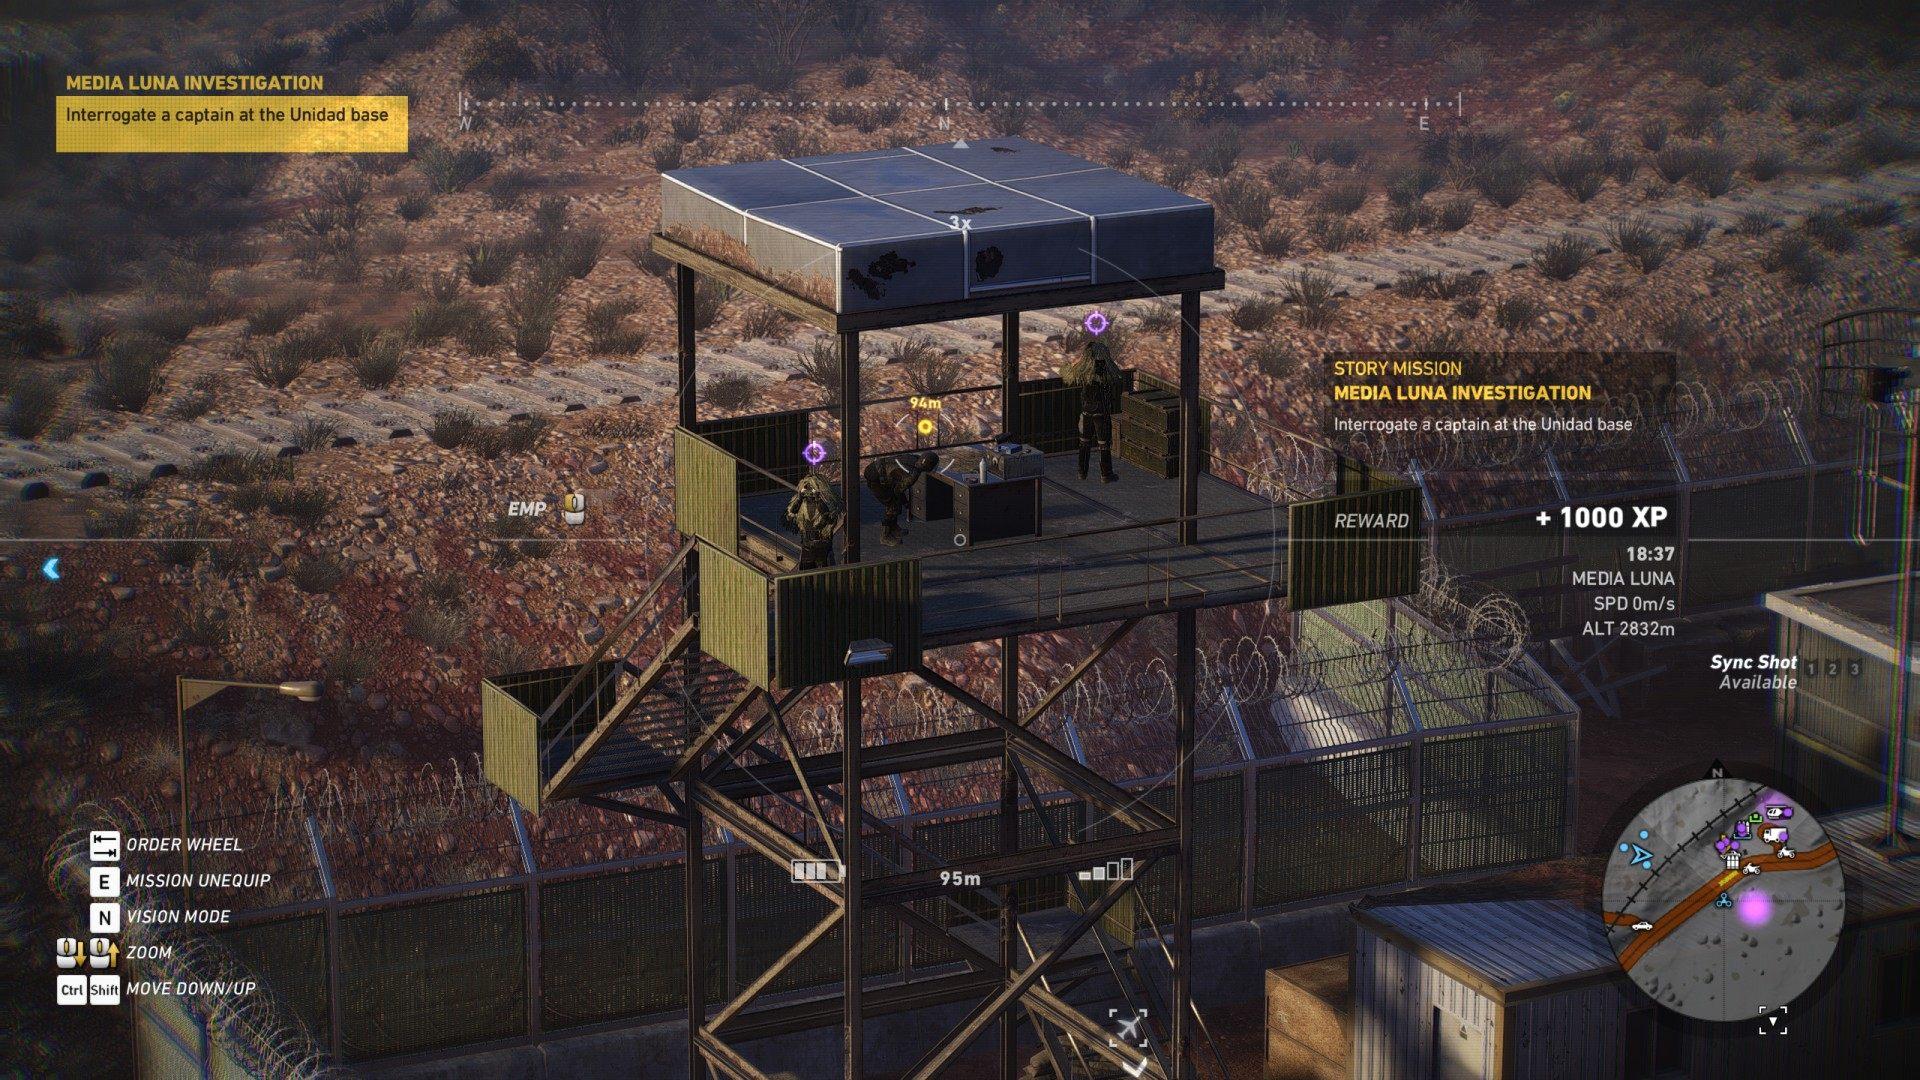 interrogate a captain at the unidad base